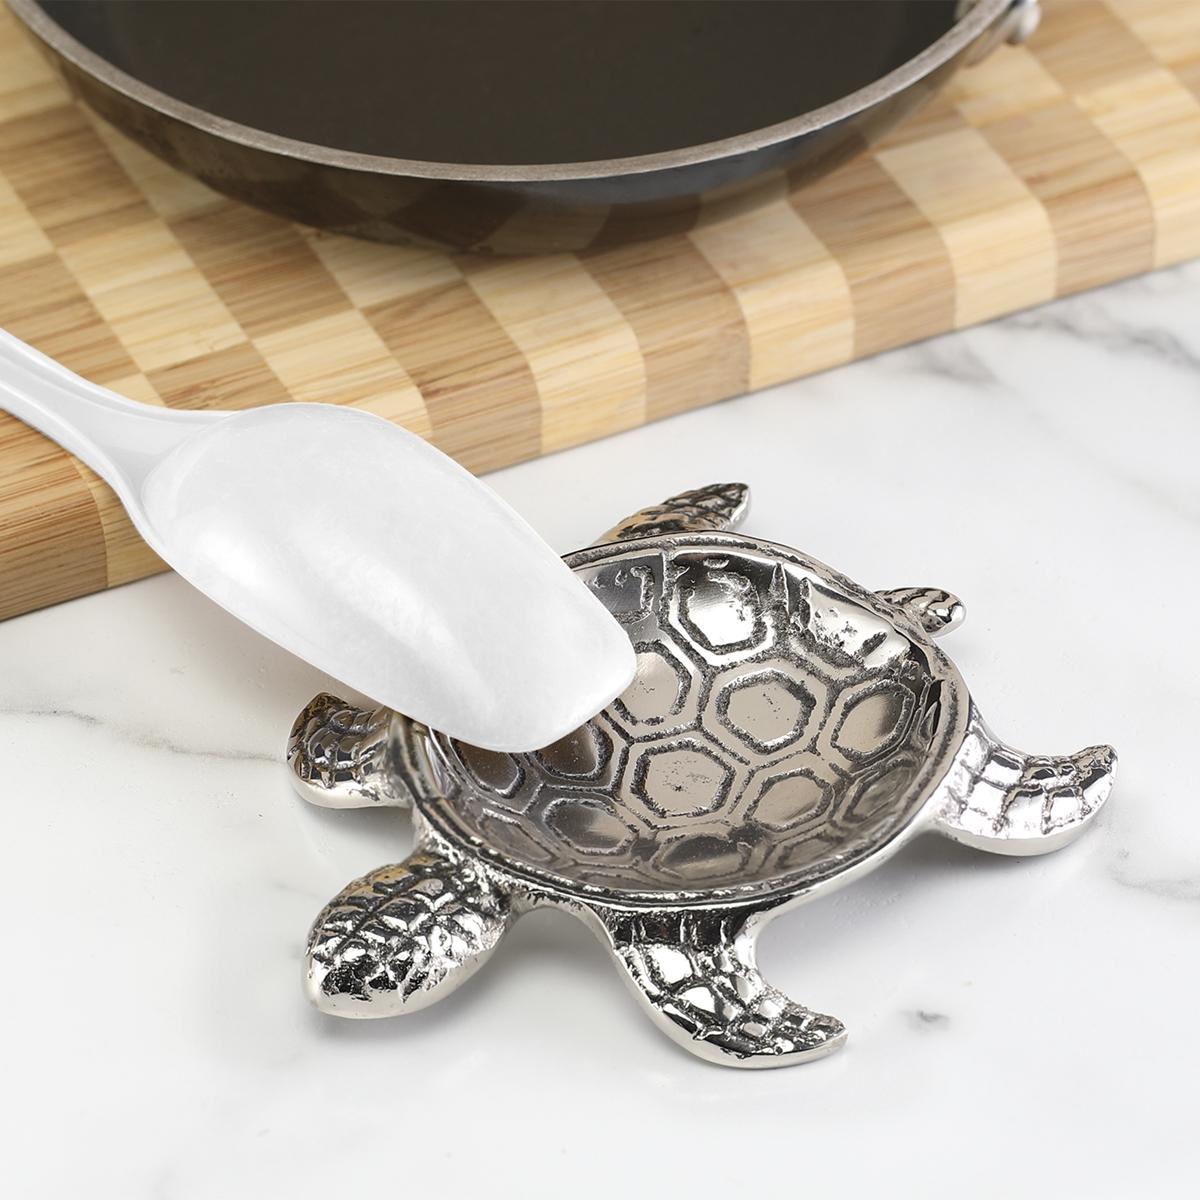 Turtle Spoon Rest